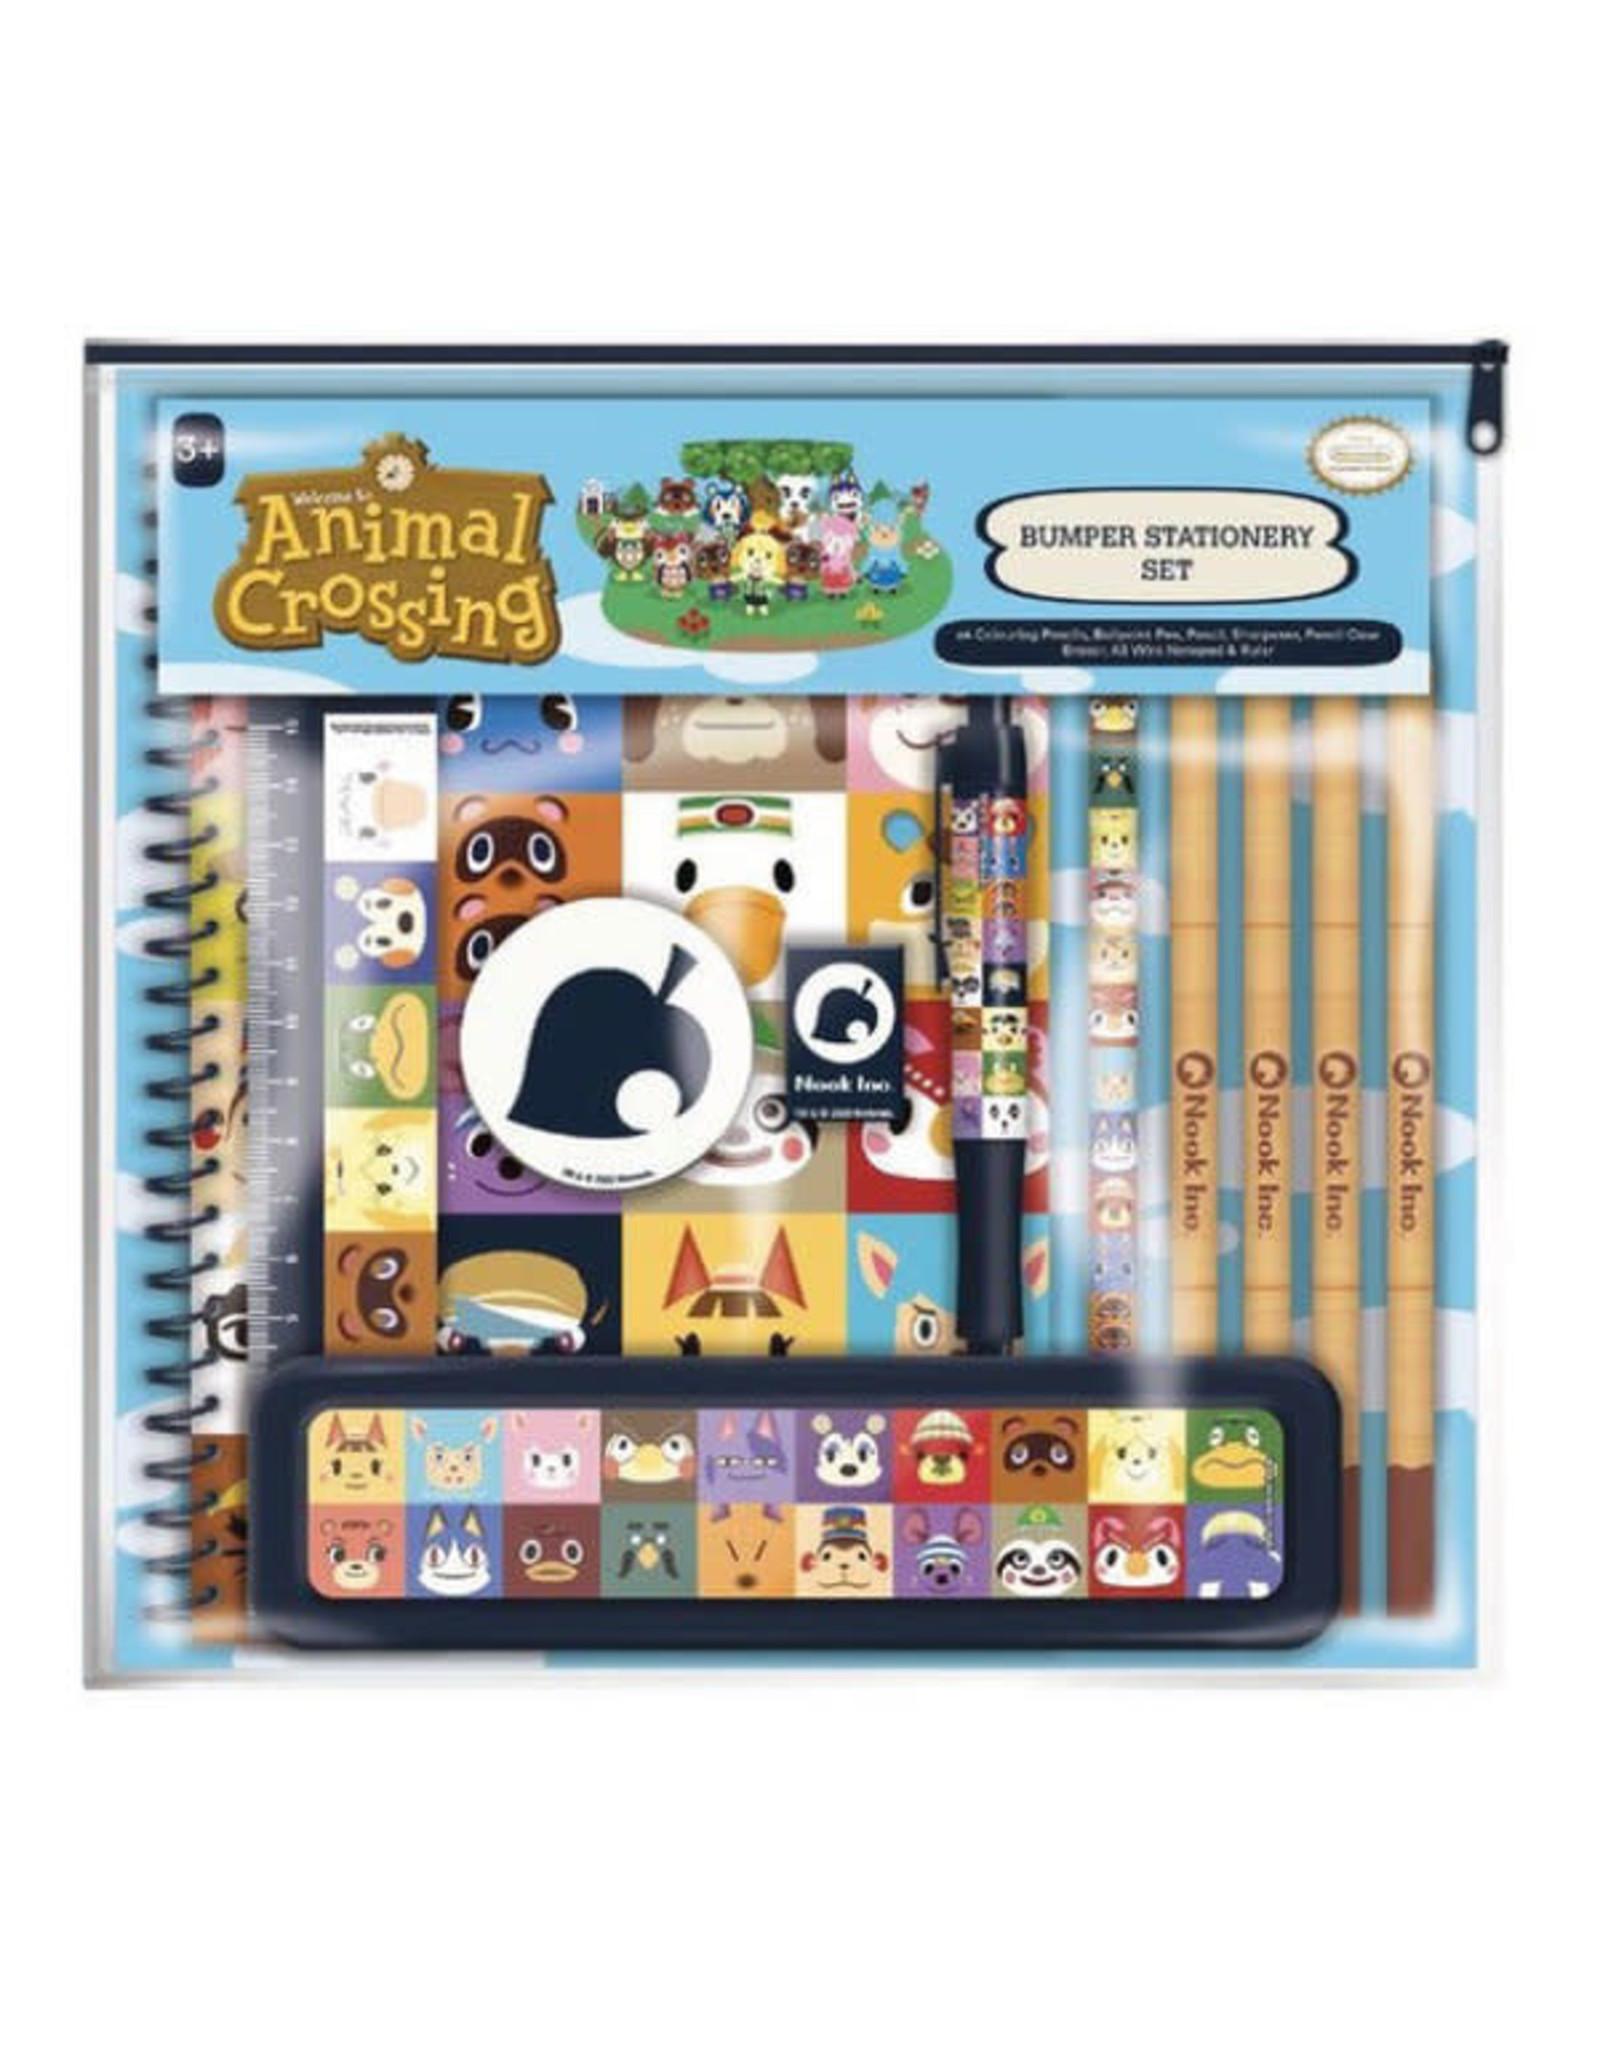 Animal Crossing - Bumper Stationery Set